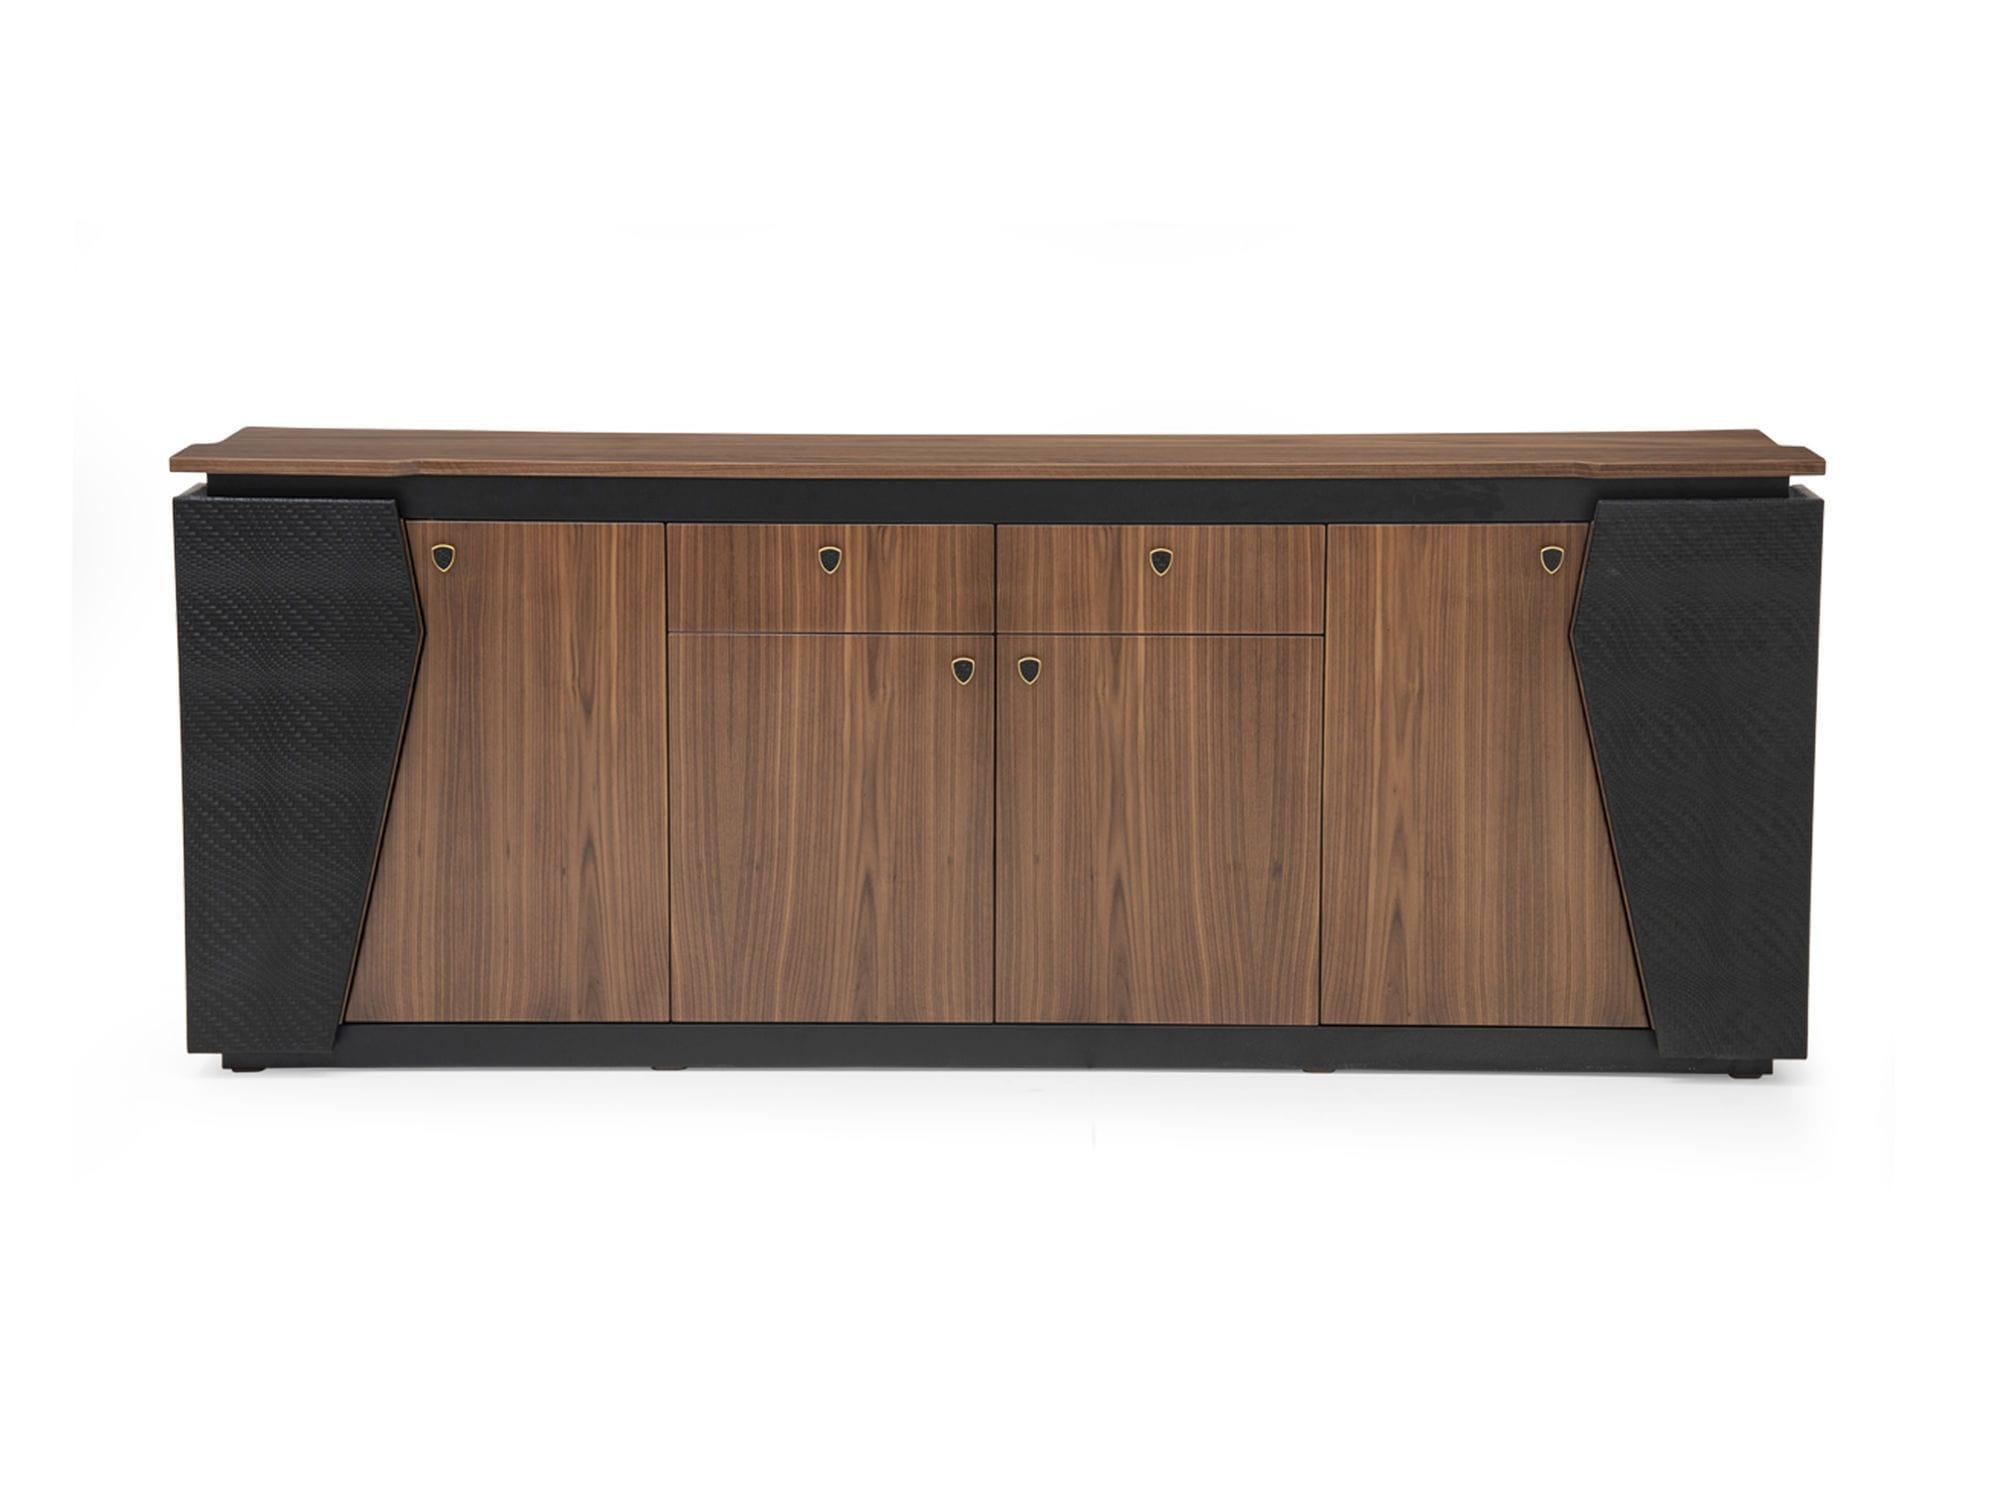 Contemporary Sideboard Gt 19 Tonino Lamborghini Wood Veneer Leather For Office